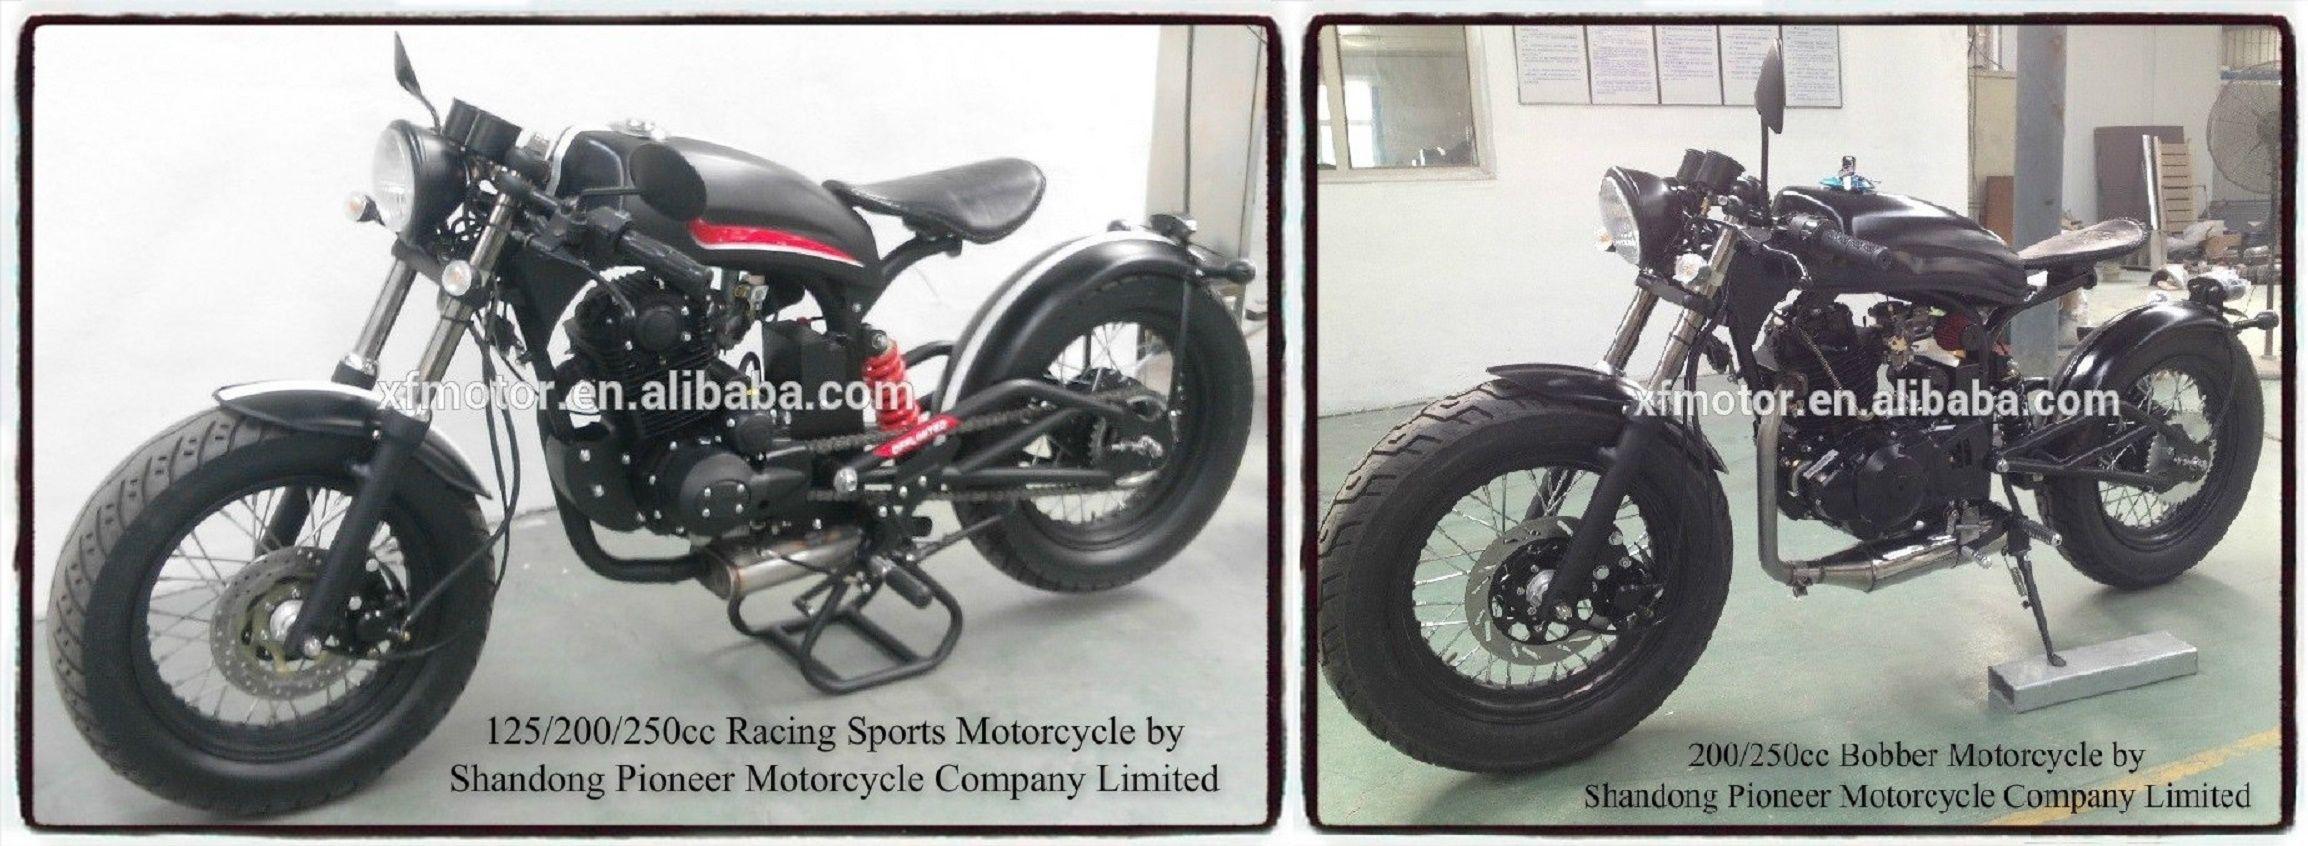 200 250cc racing sports motorcycle honda cb200 suzuki gs200 suzuki gs250 engine